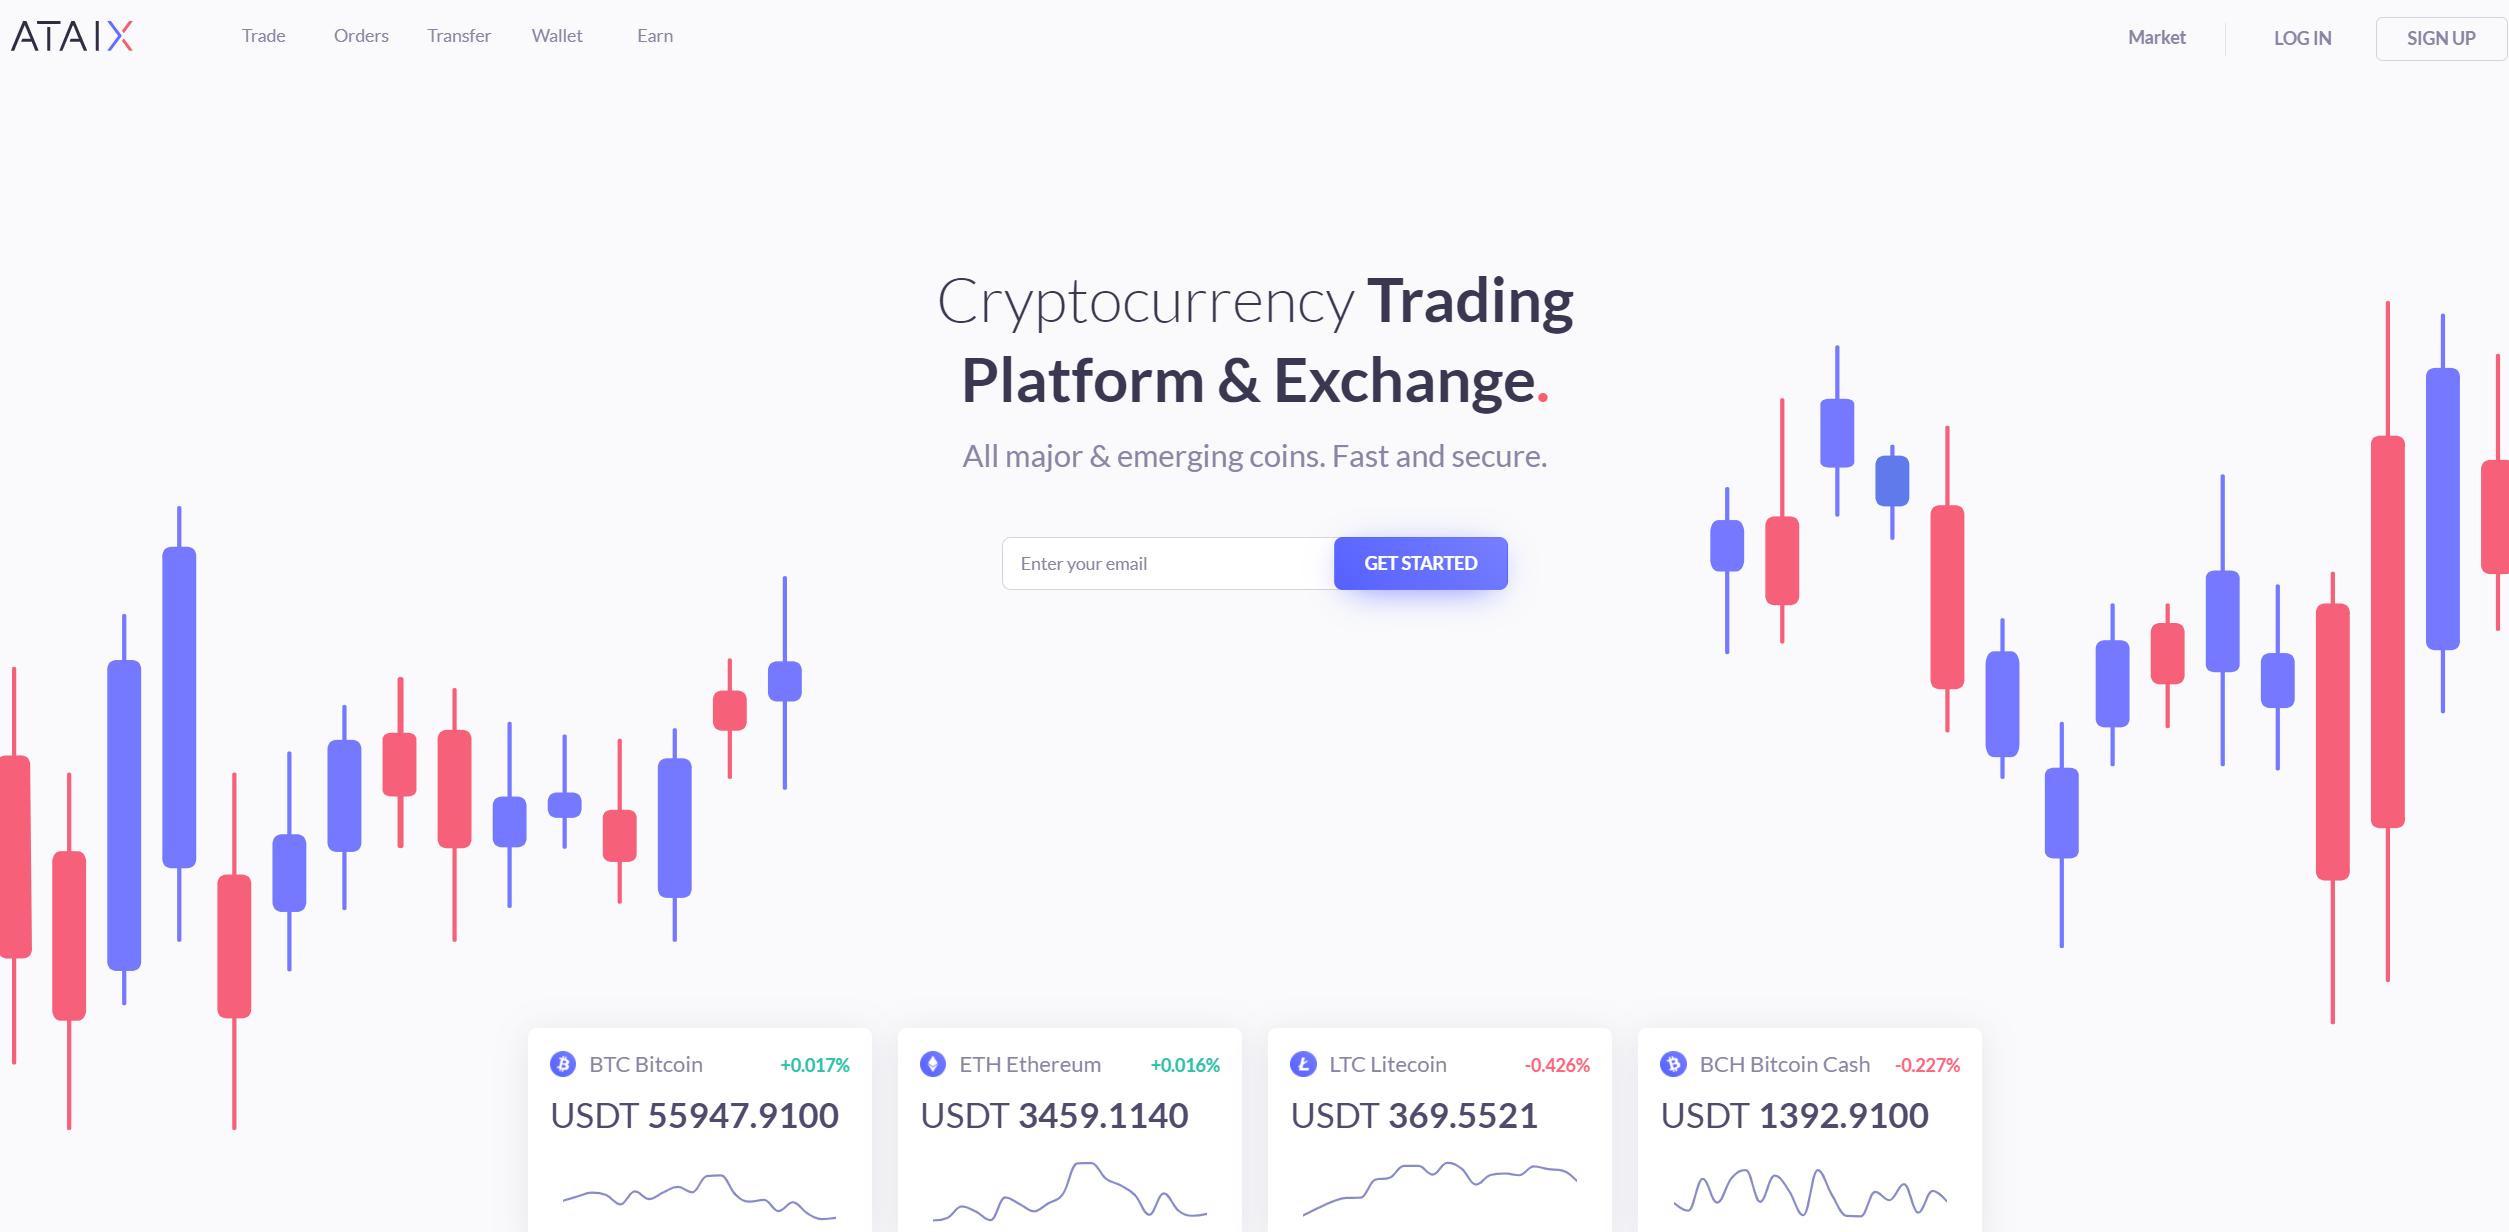 ATAIX Exchange